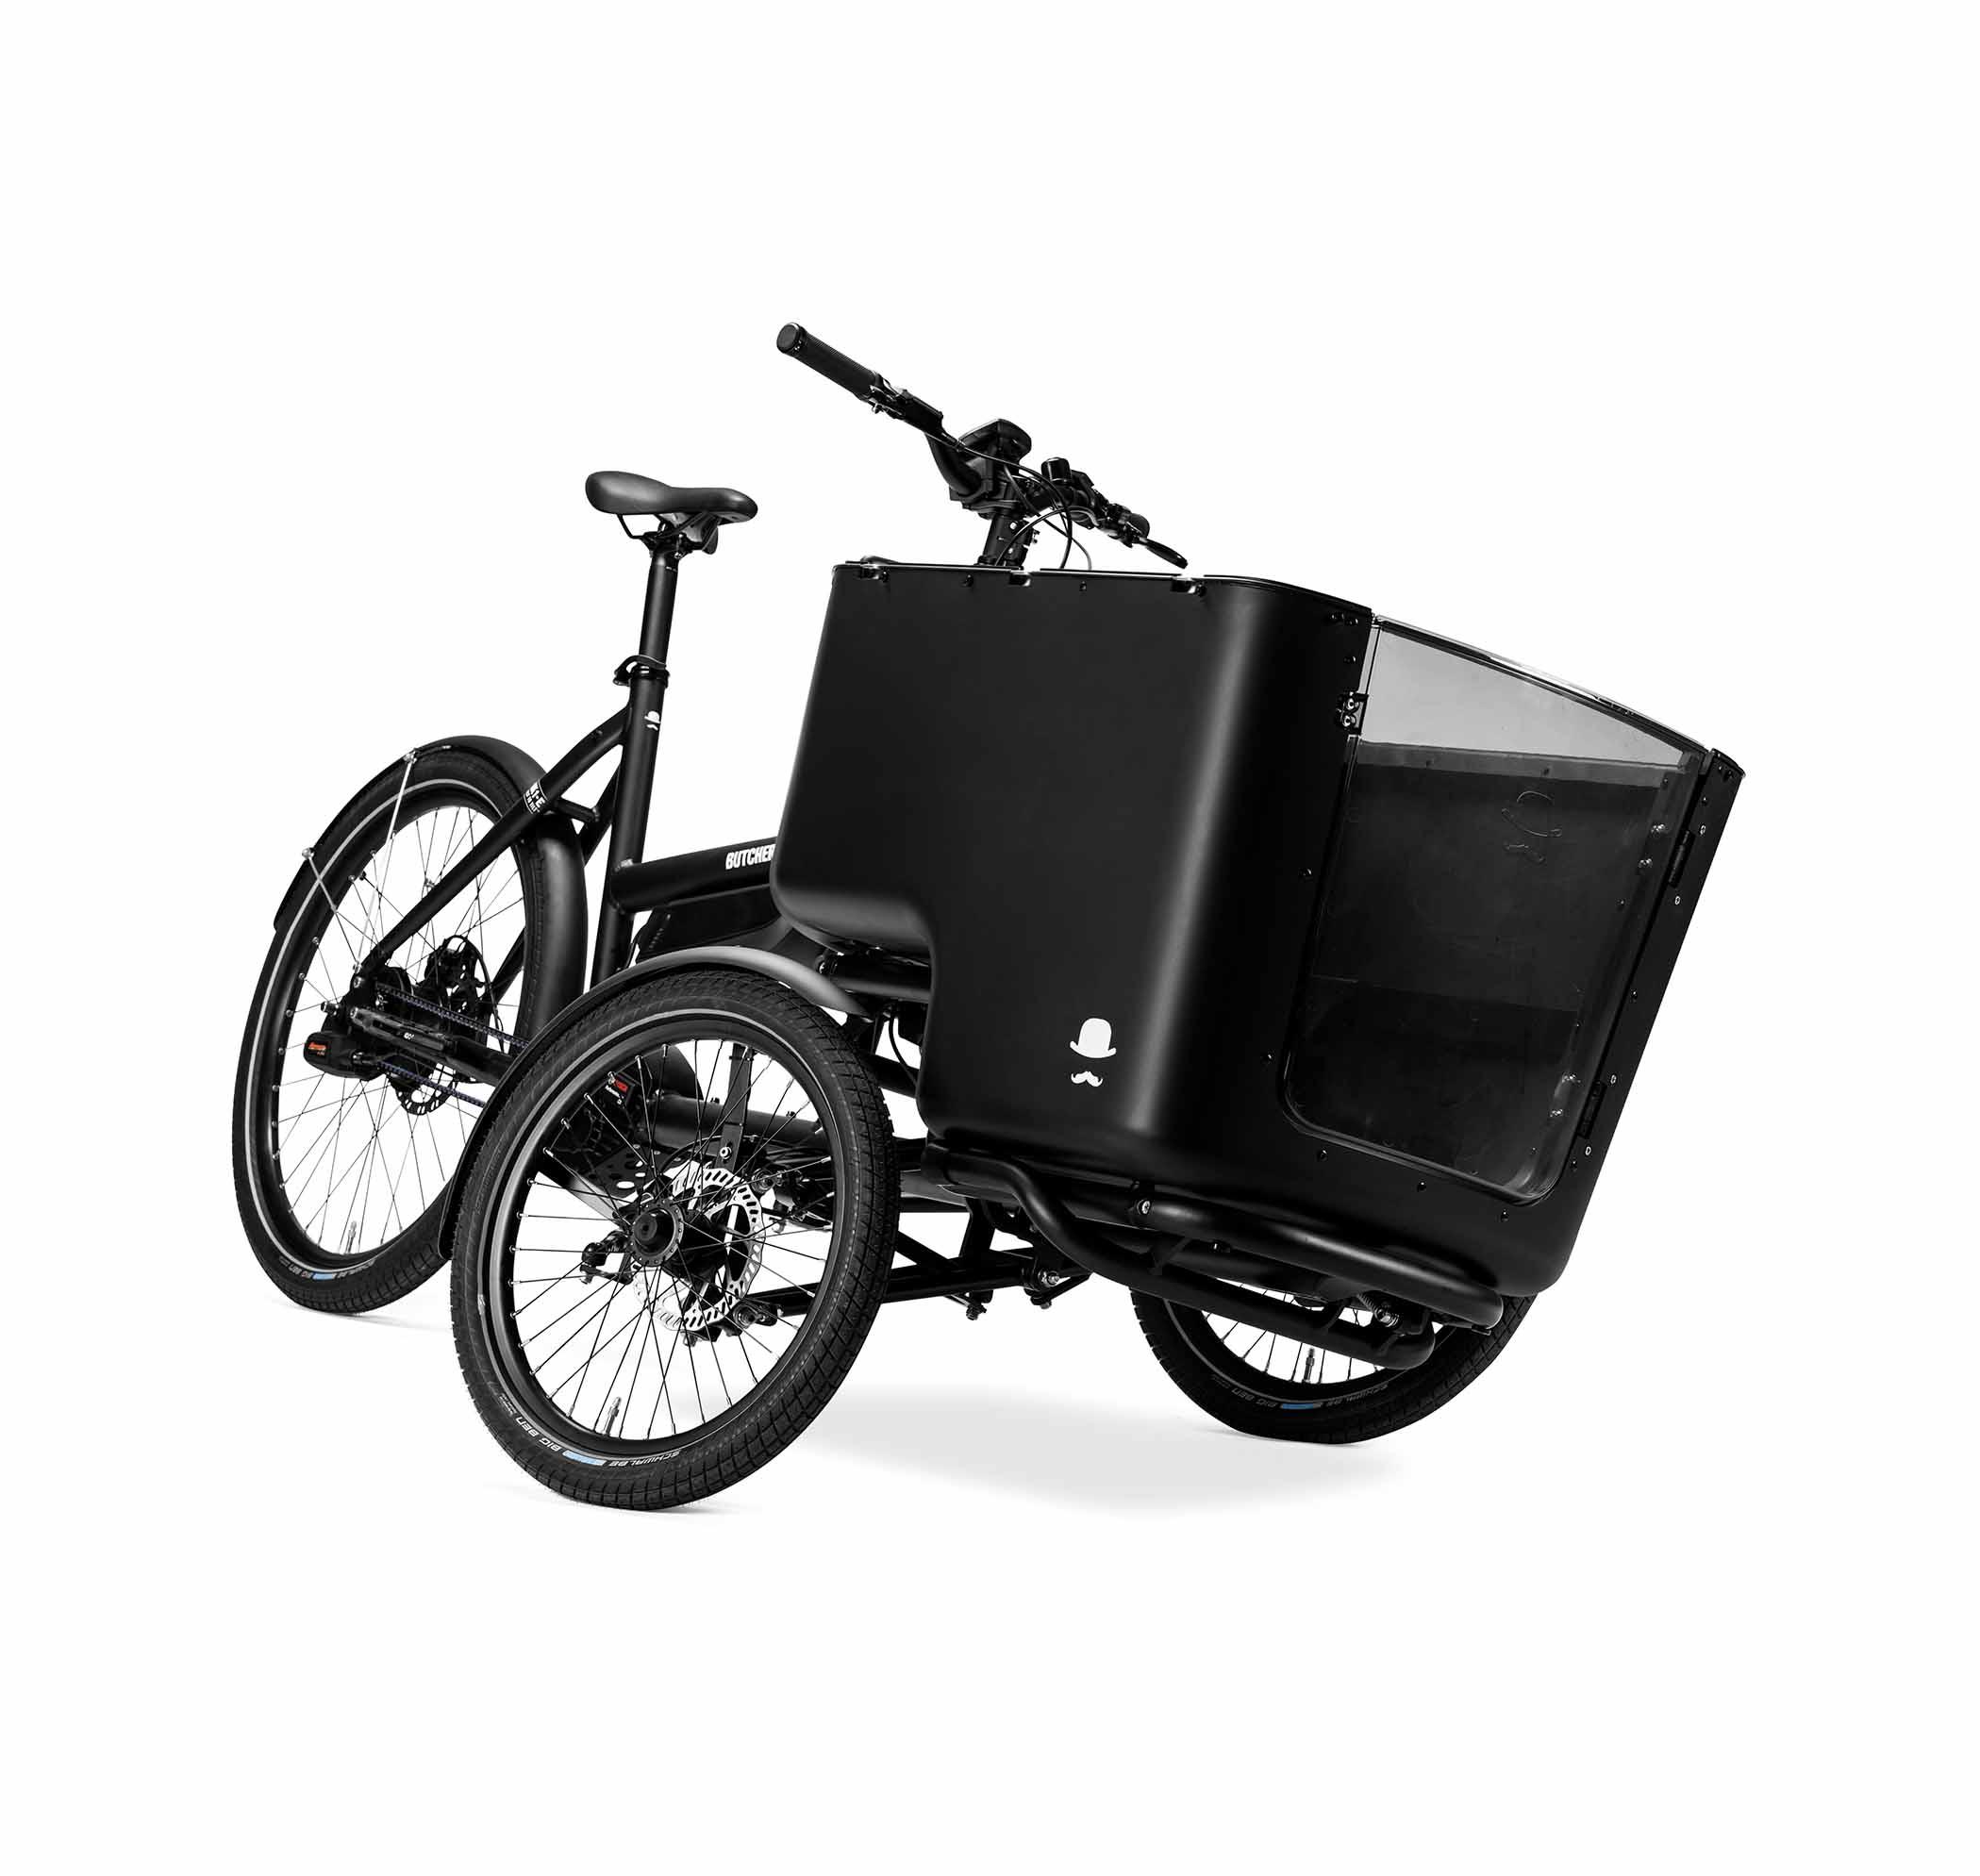 Butchers_Bicycles_Rodeo_Bike_Mk1_E_Automatic_Black